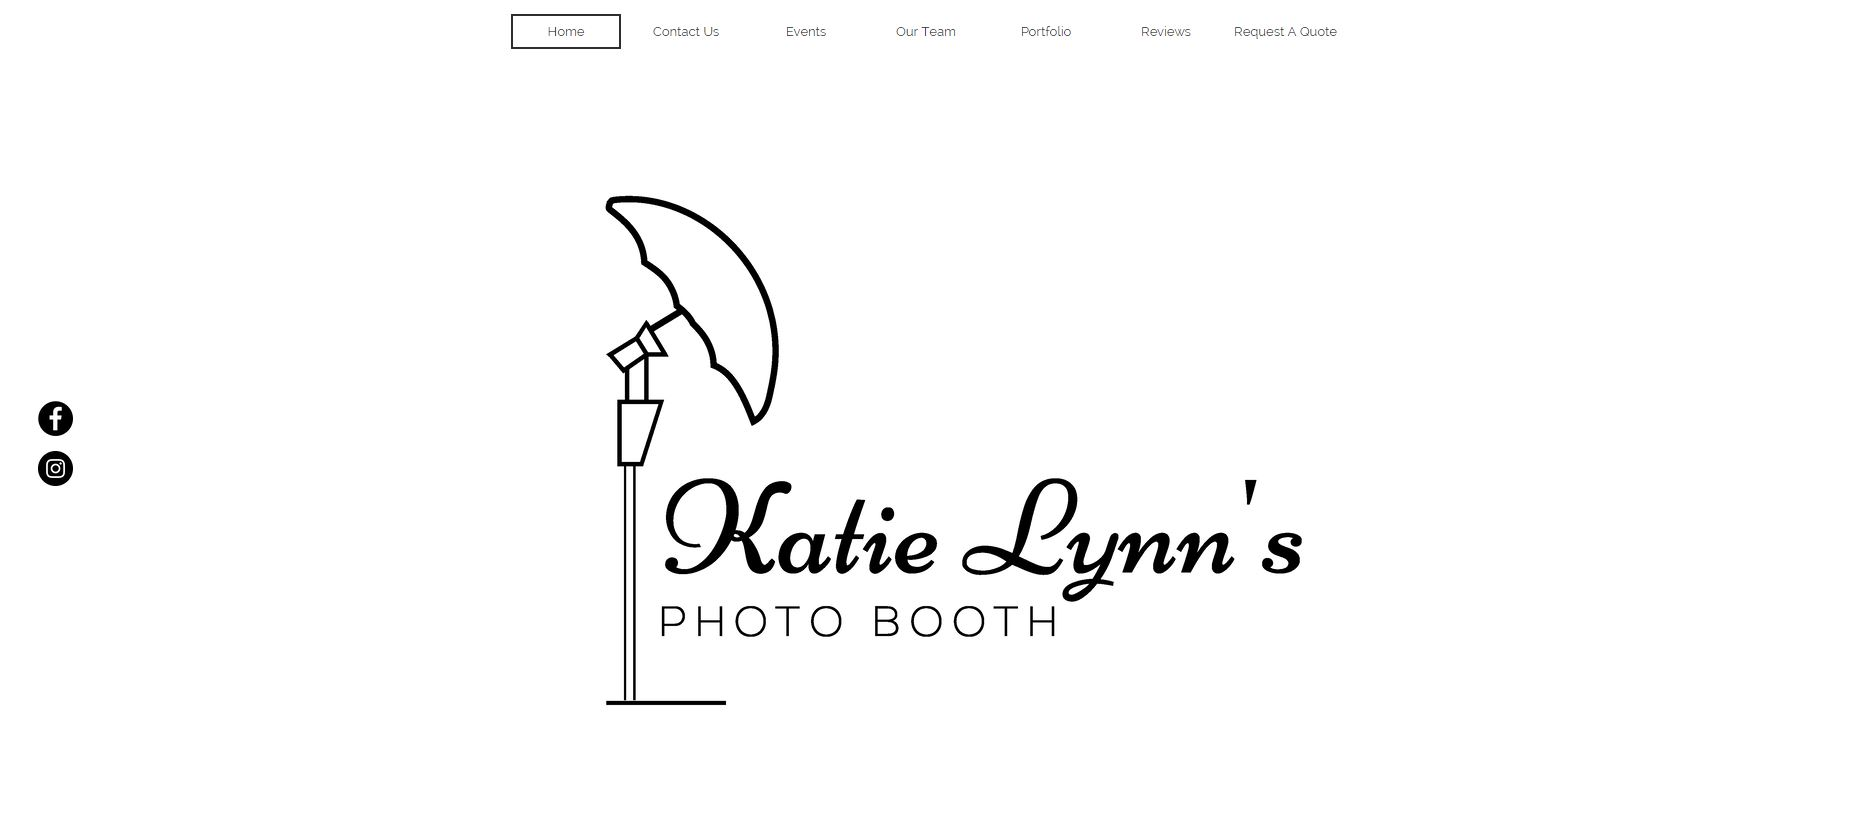 Katie Lynn's Photo Booth